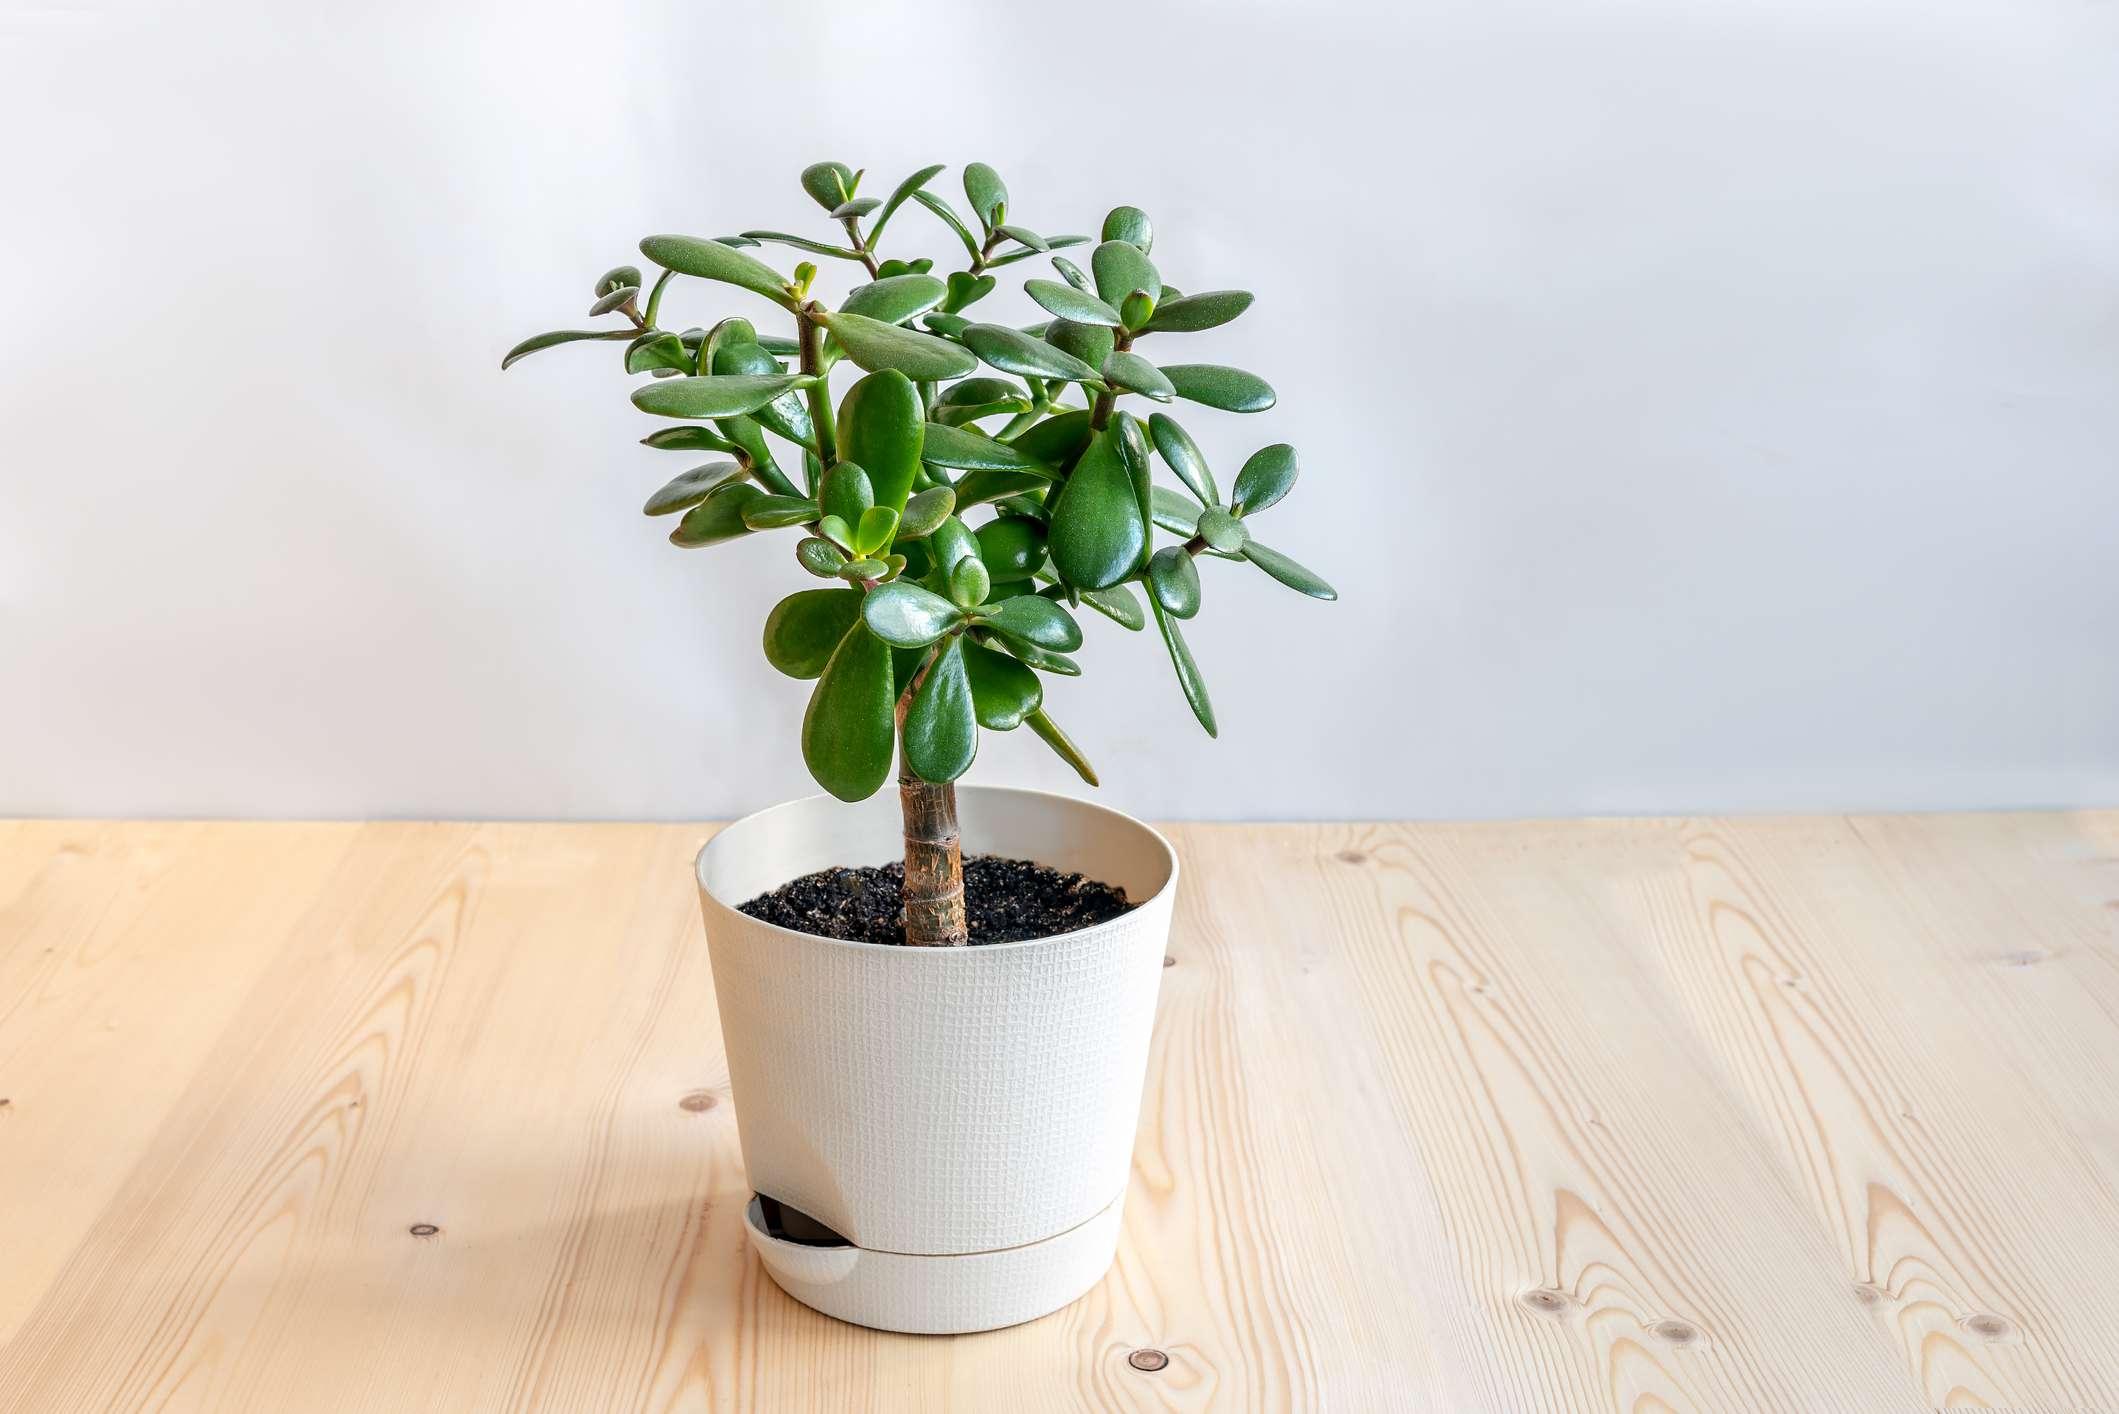 Jade plant care